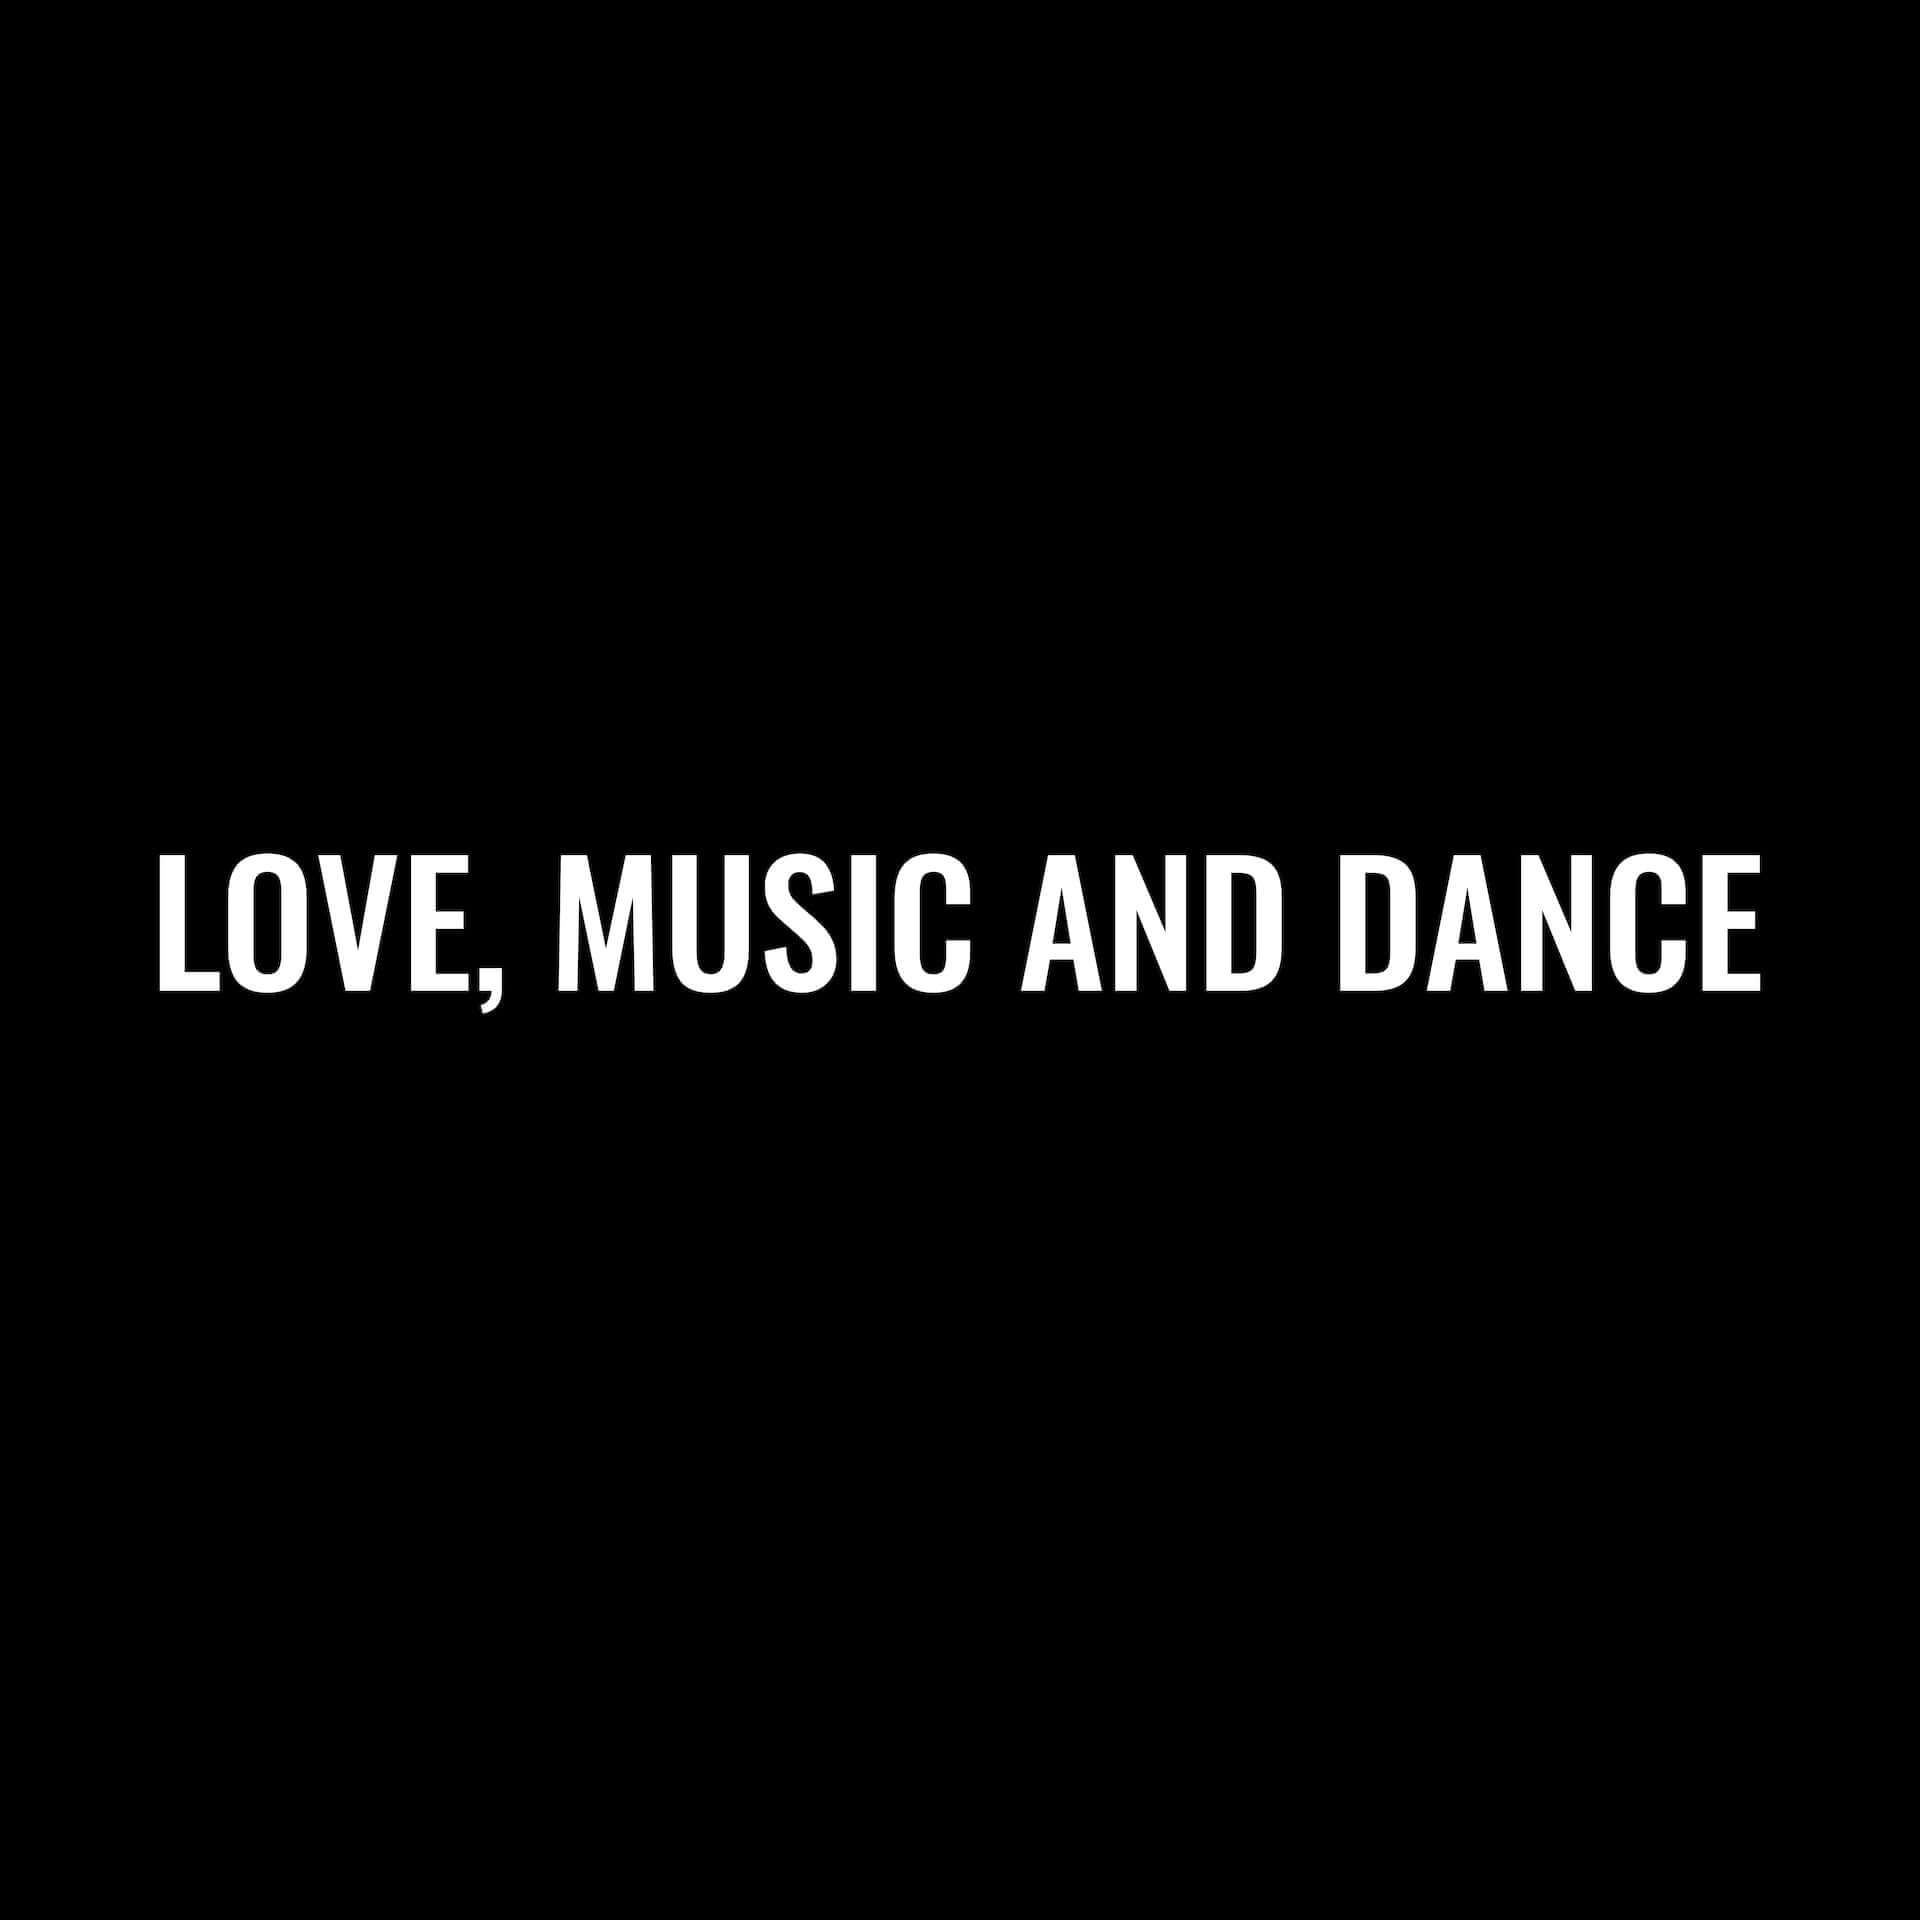 ALIの新EP『LOVE, MUSIC AND DANCE』が発売決定!梅田サイファー、なみちえ、Shing02、Dos Monos、HIYADAMらが参加 music201217_ali_2-1920x1920